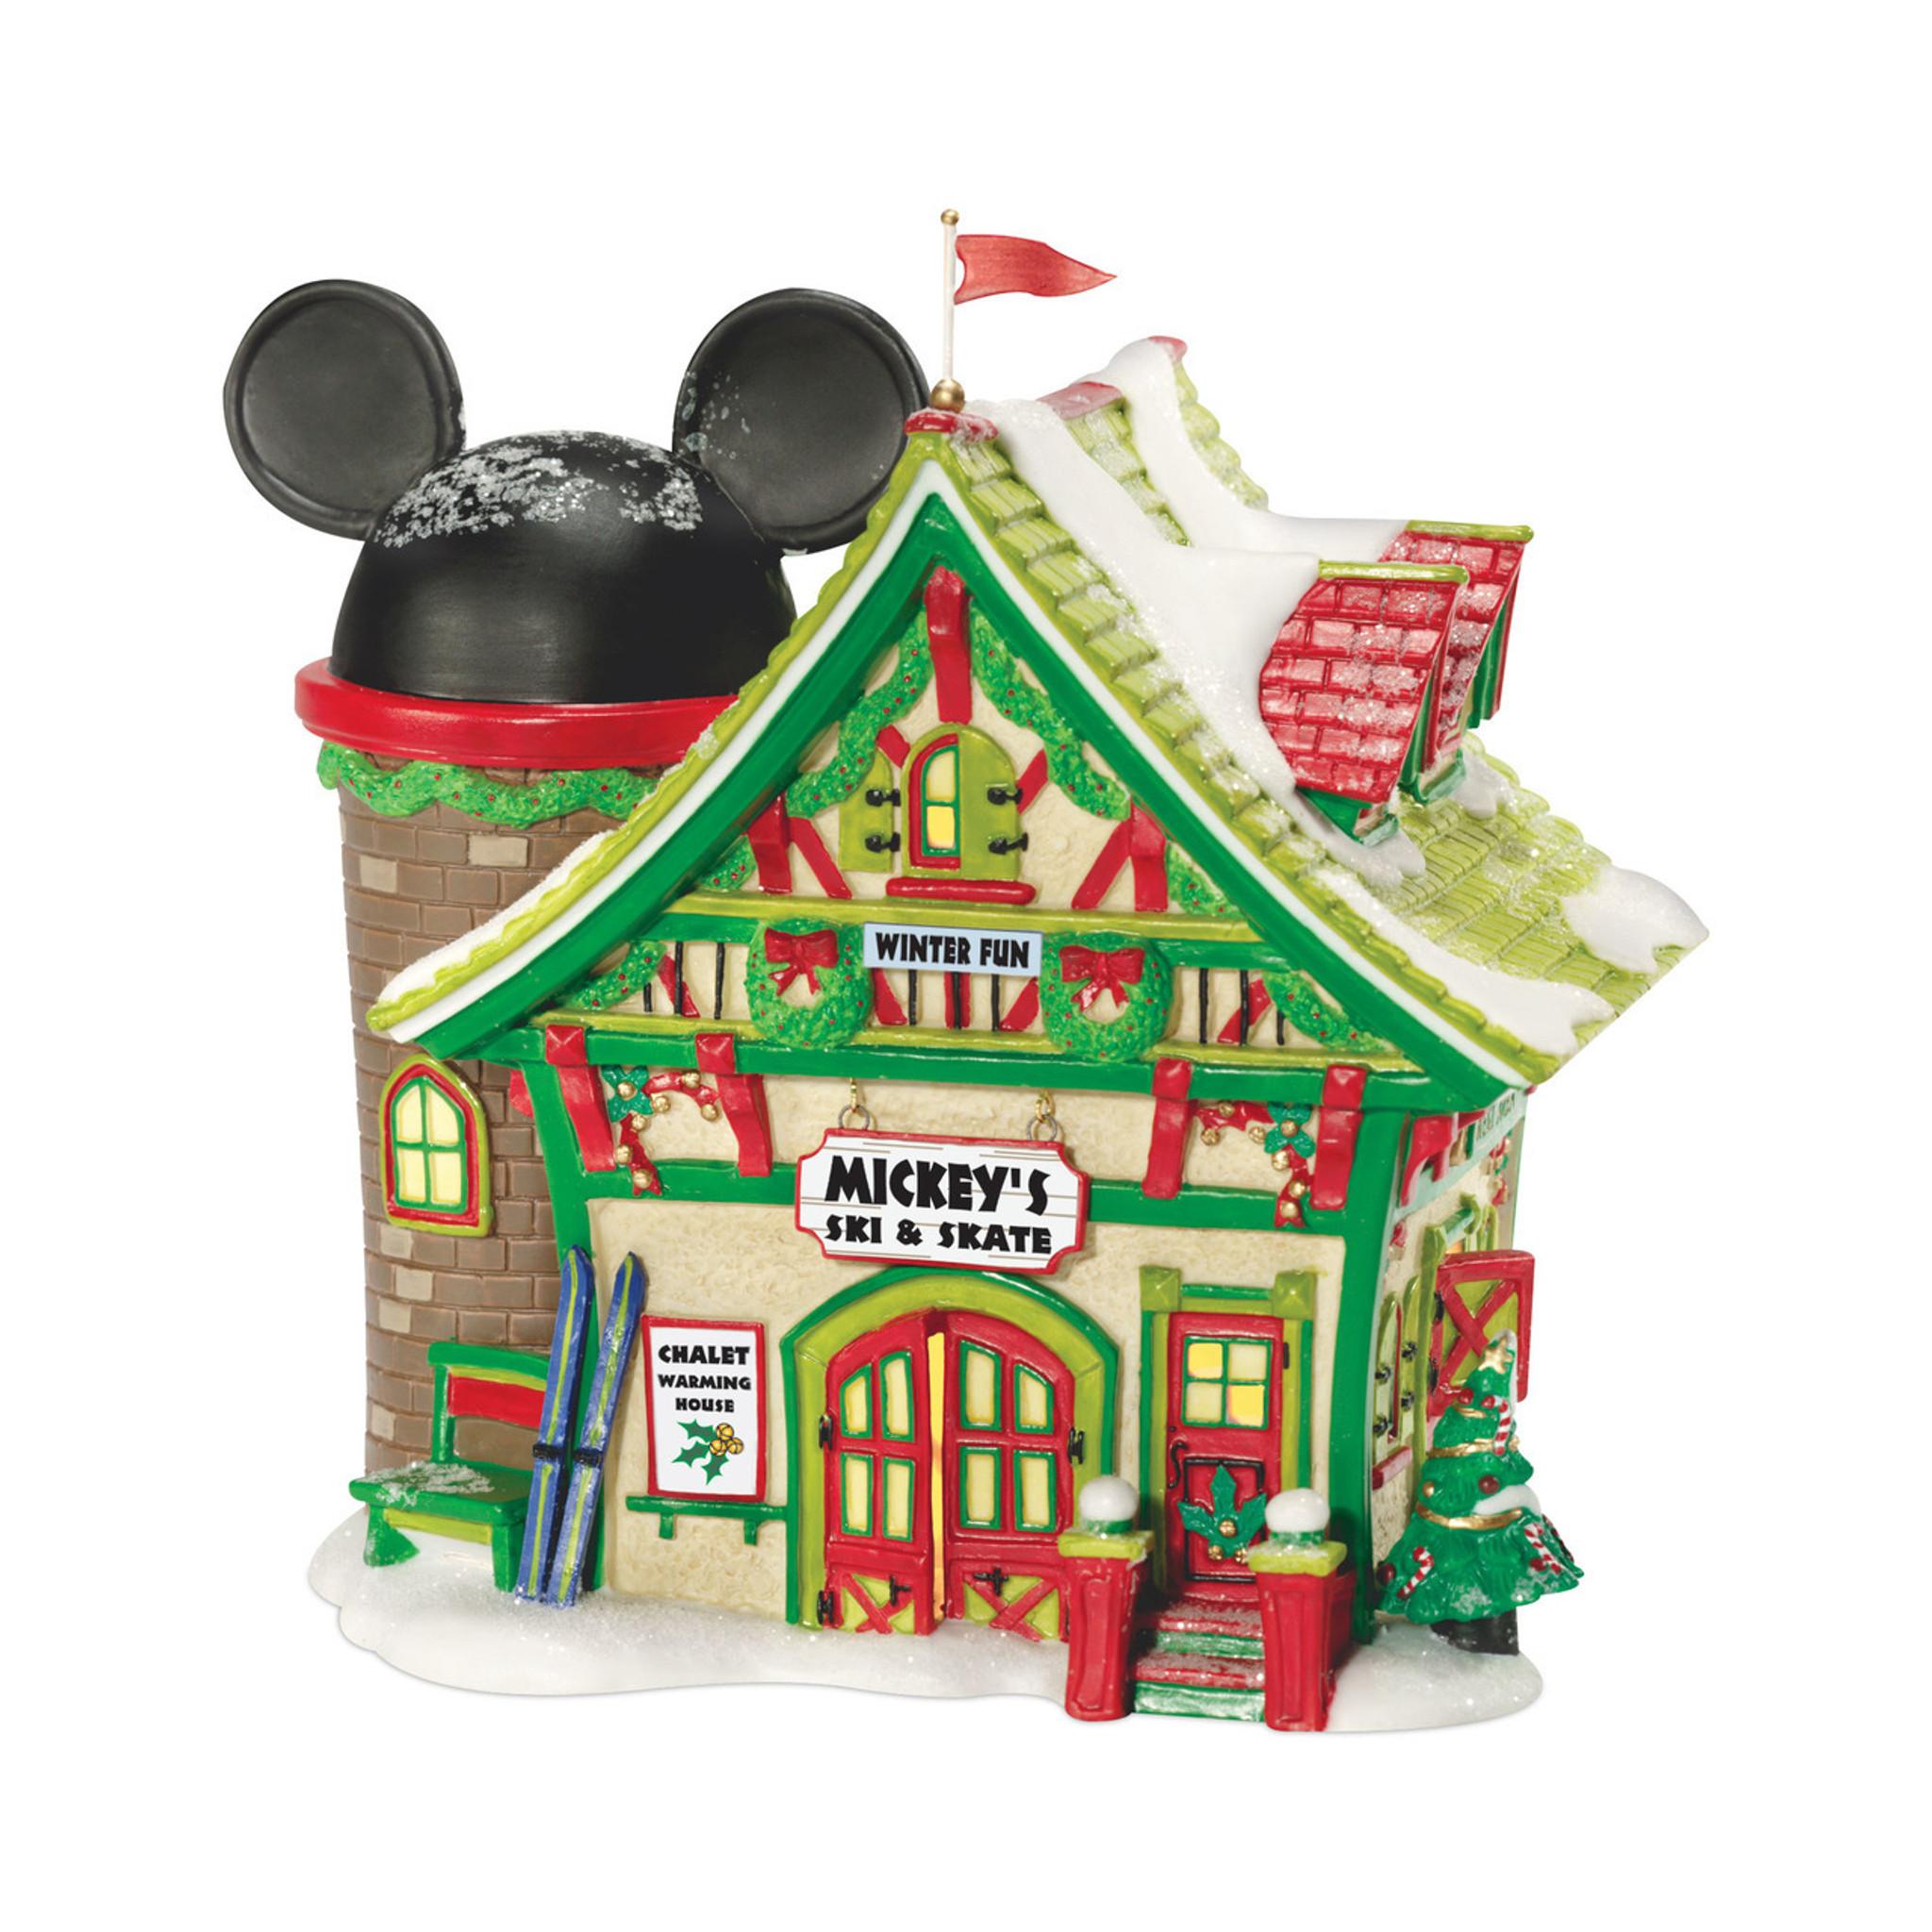 department 56 disney christmas village mickeys ski and skate building 811263